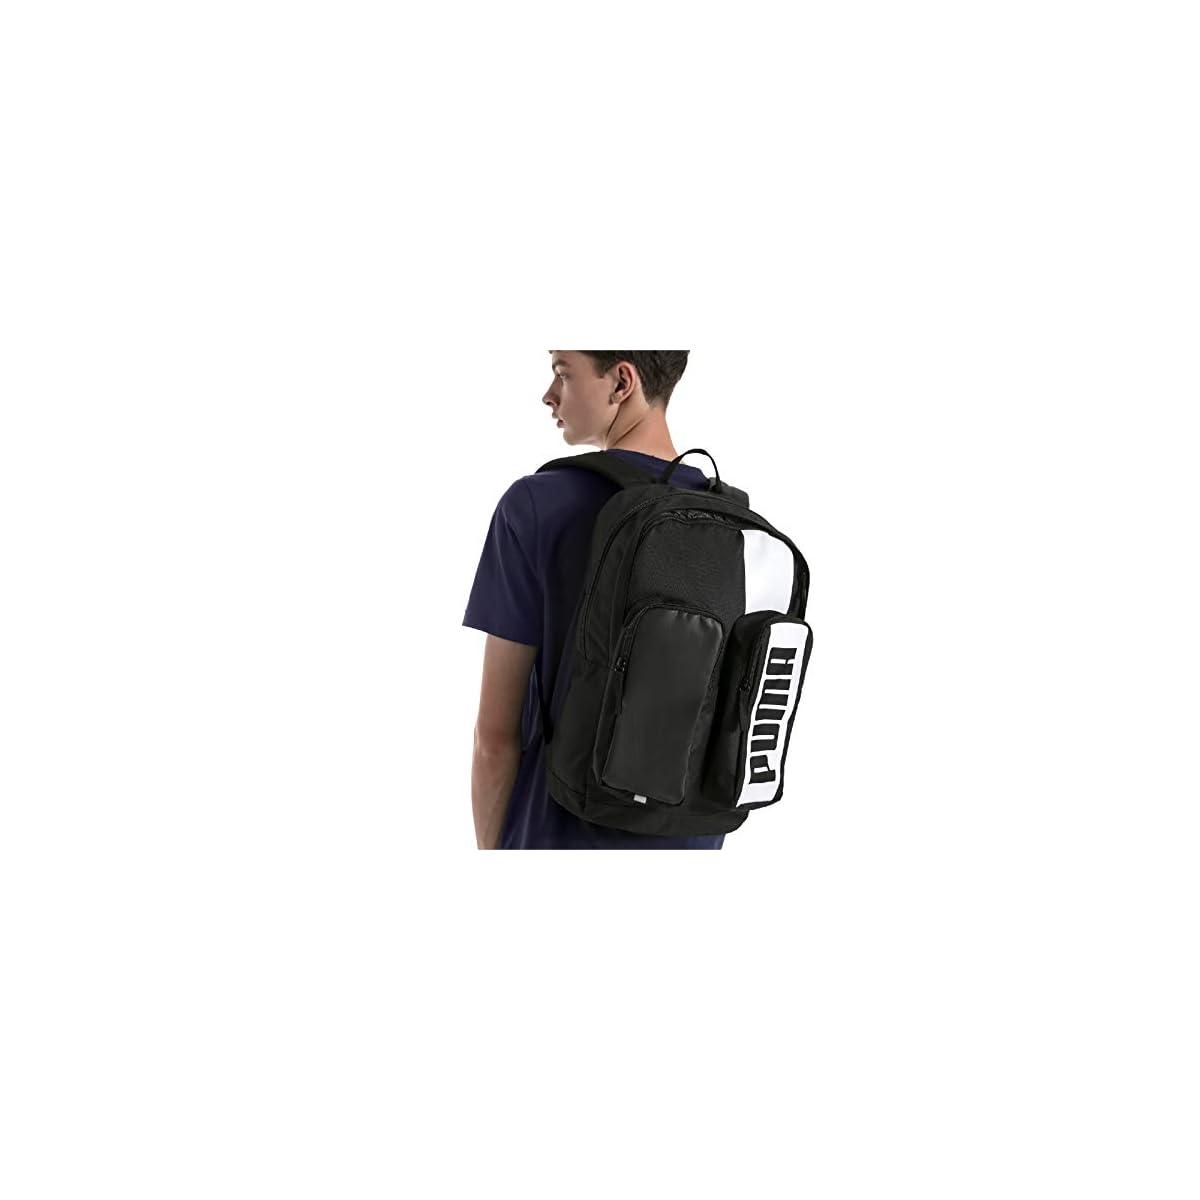 4107nrj%2BEuL. SS1200  - Puma Deck Backpack II Rucksack Schwarz